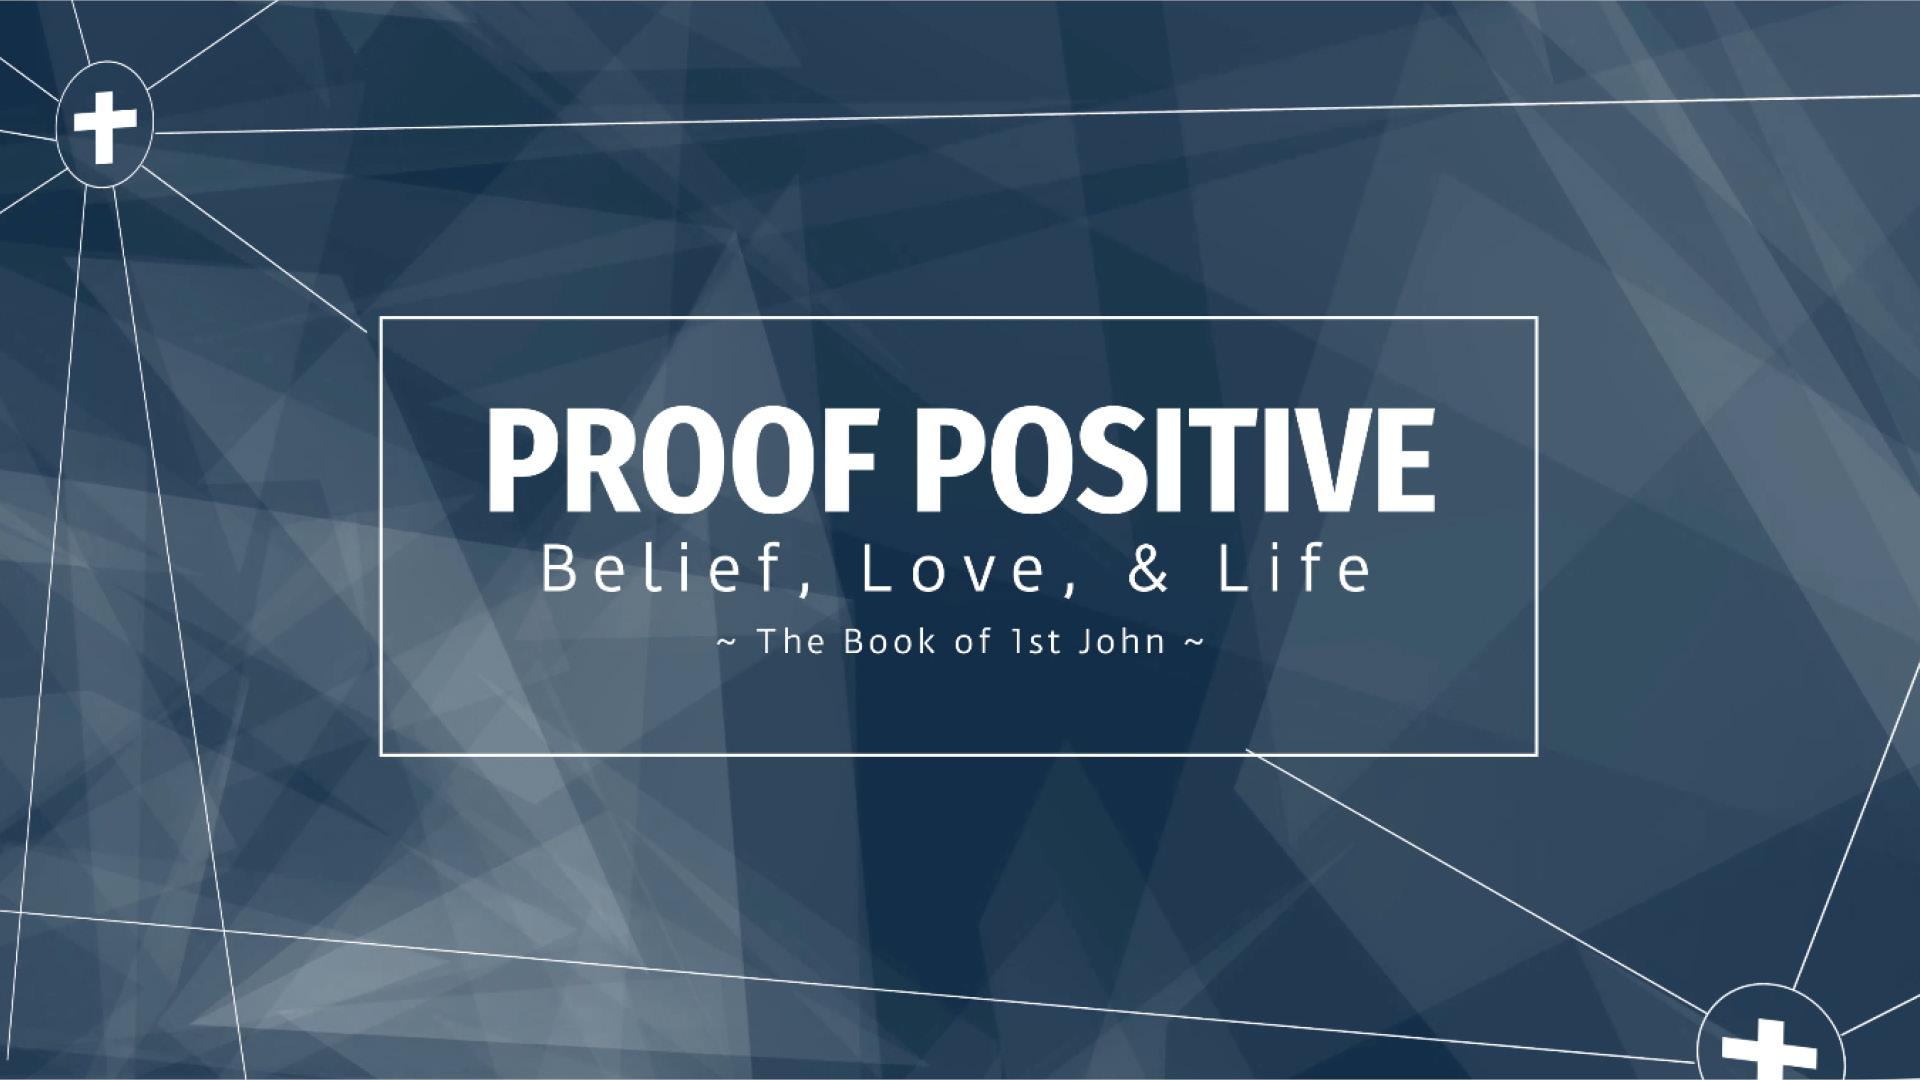 Proof-Positive-SS-Wide.jpg